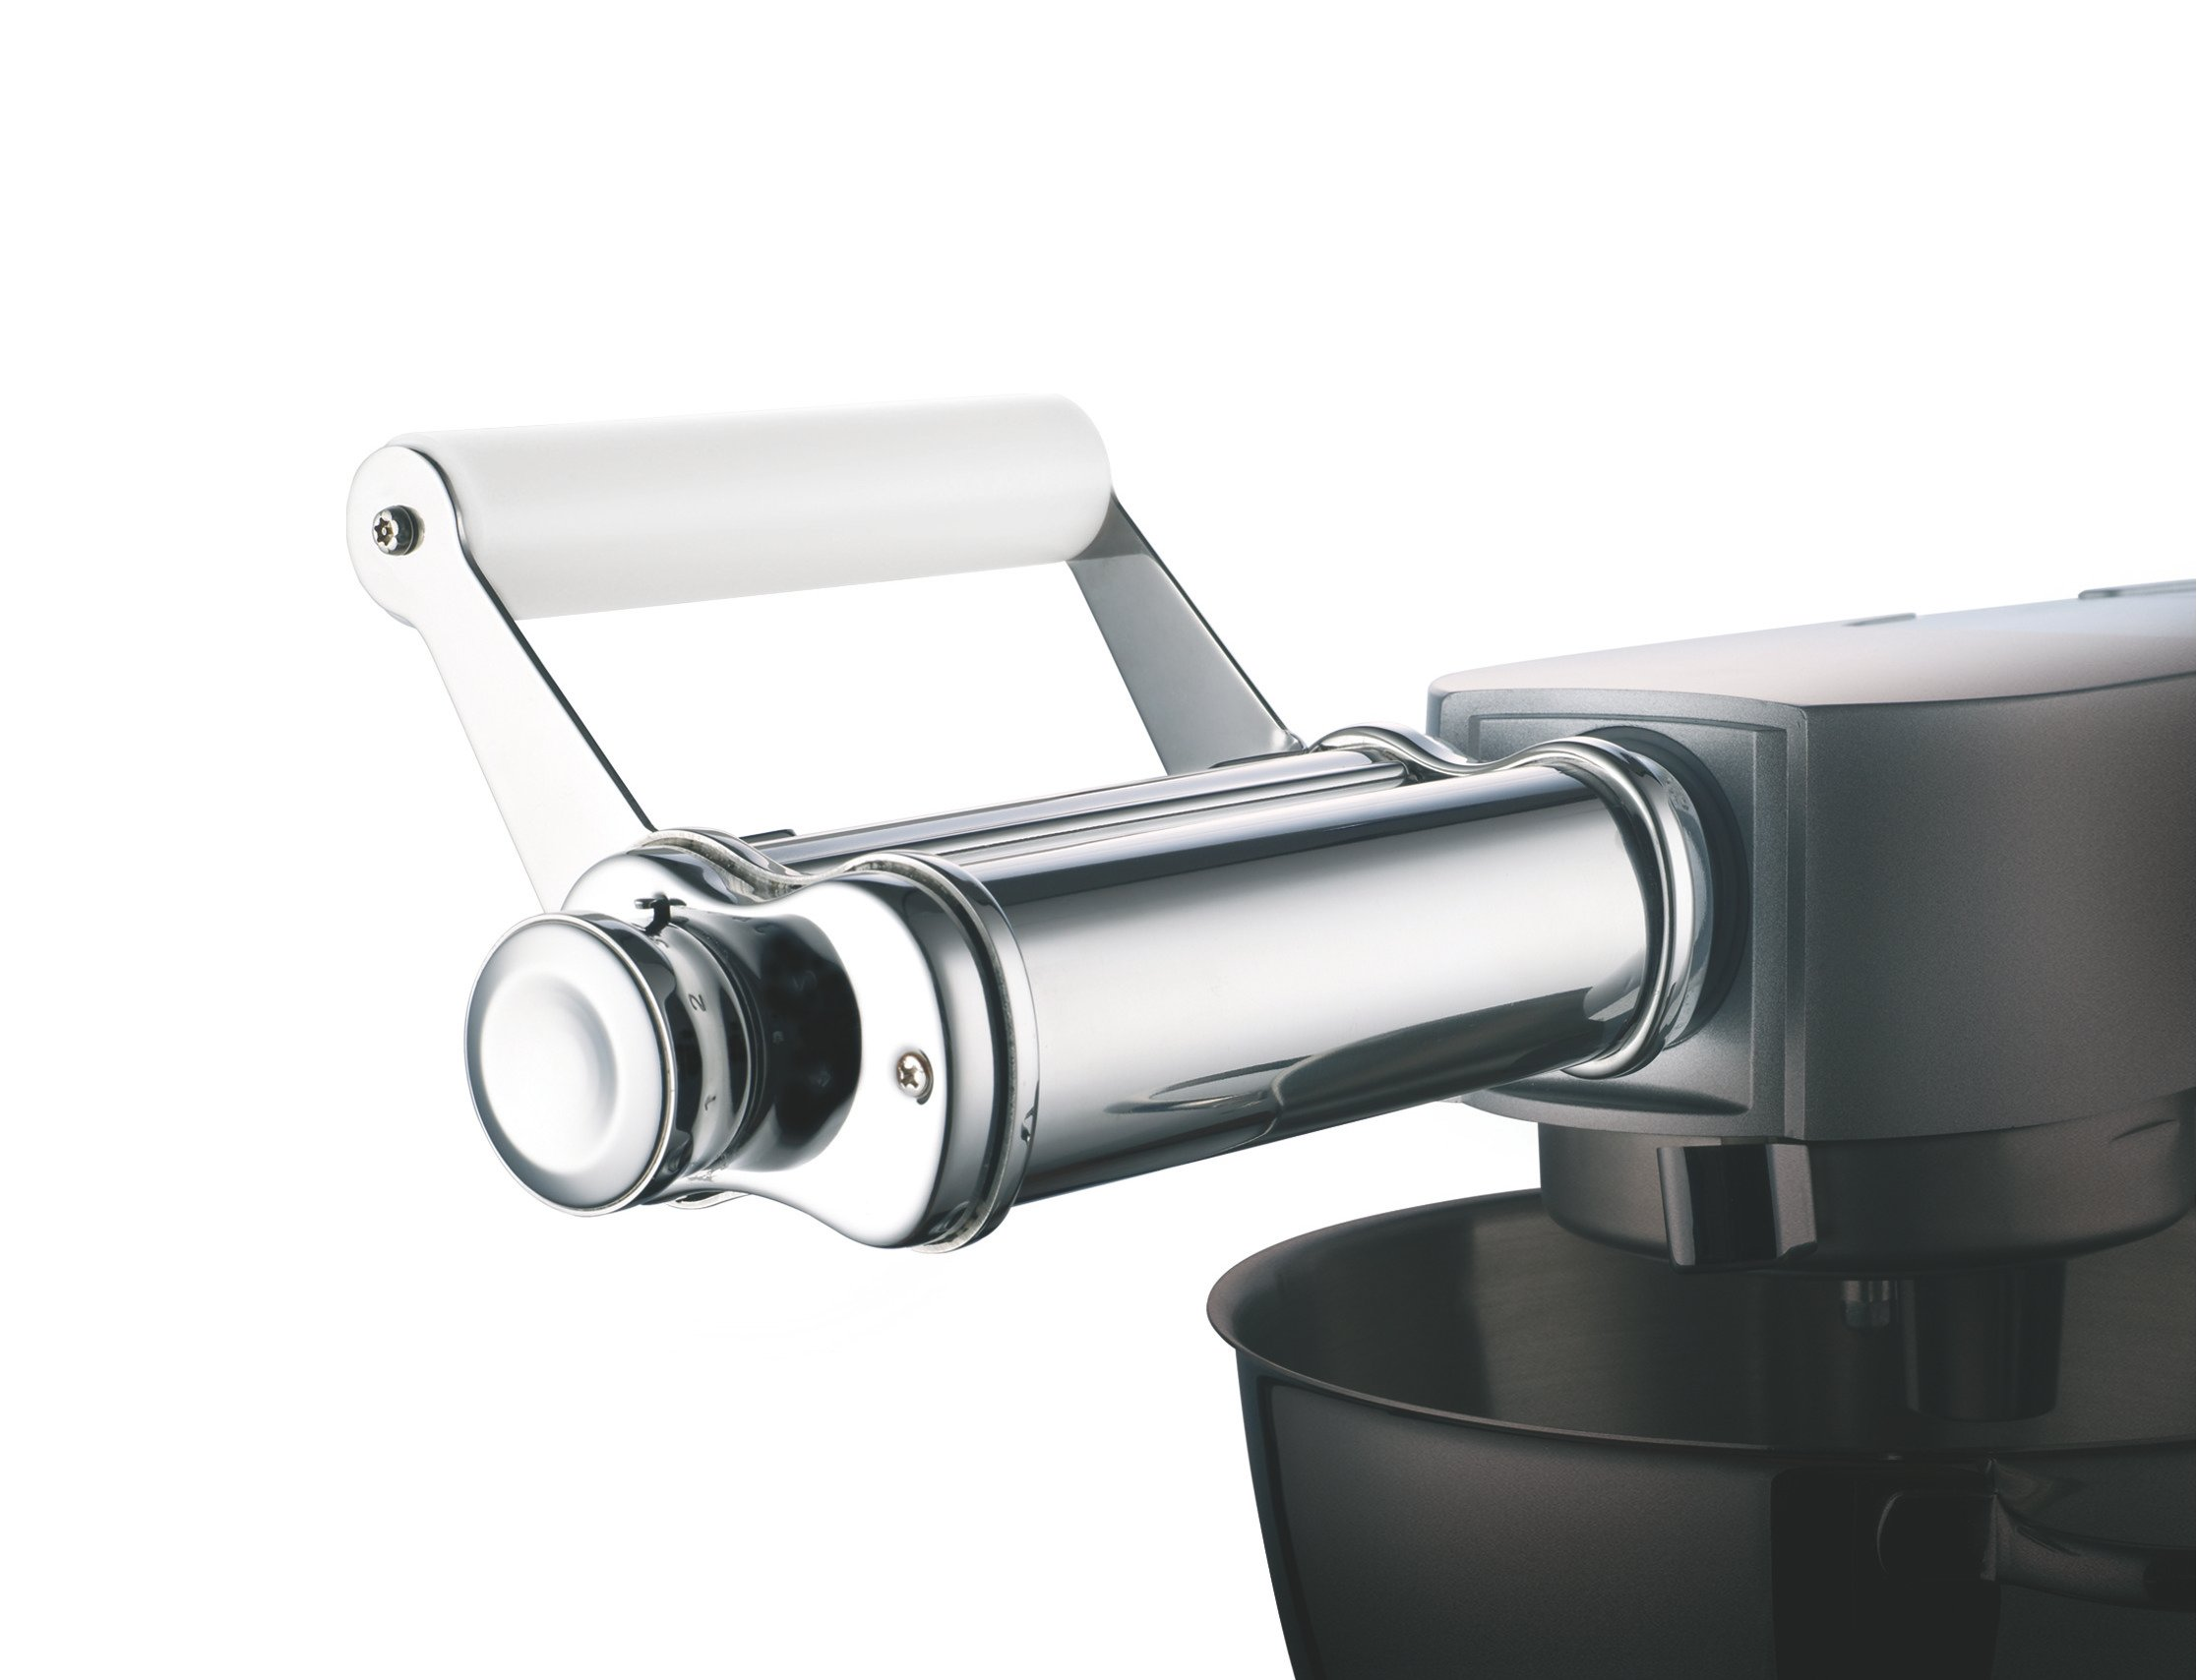 Kenwood AT970A Metal Pasta Roller, Silver